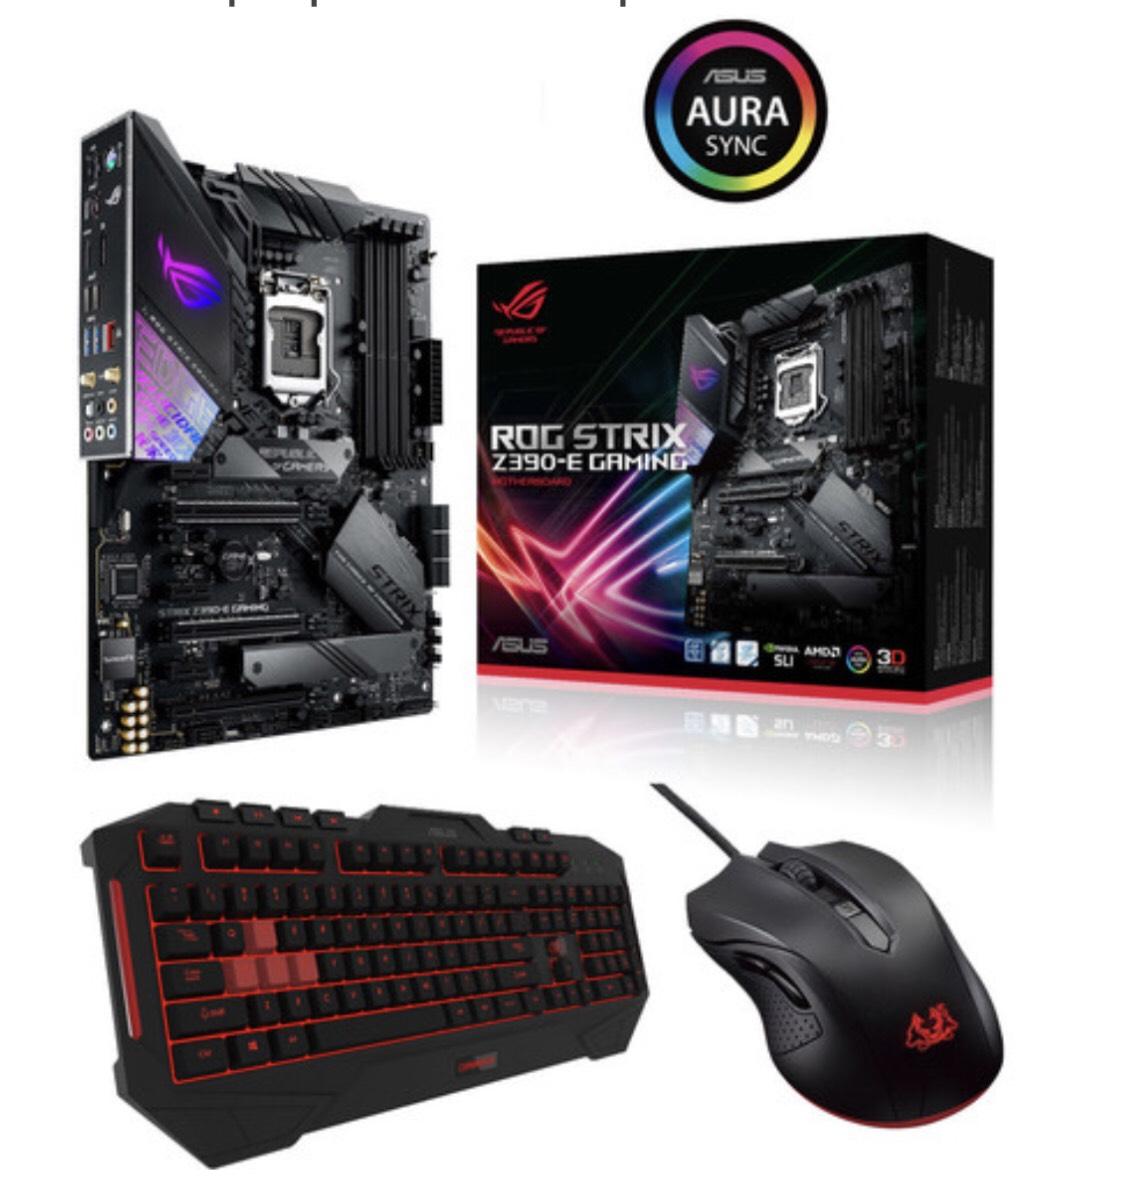 Carte mère Asus ROG Strix Z390-E Gaming + Clavier Asus Cerberus (AZERTY) + Souris Cerberus Mouse